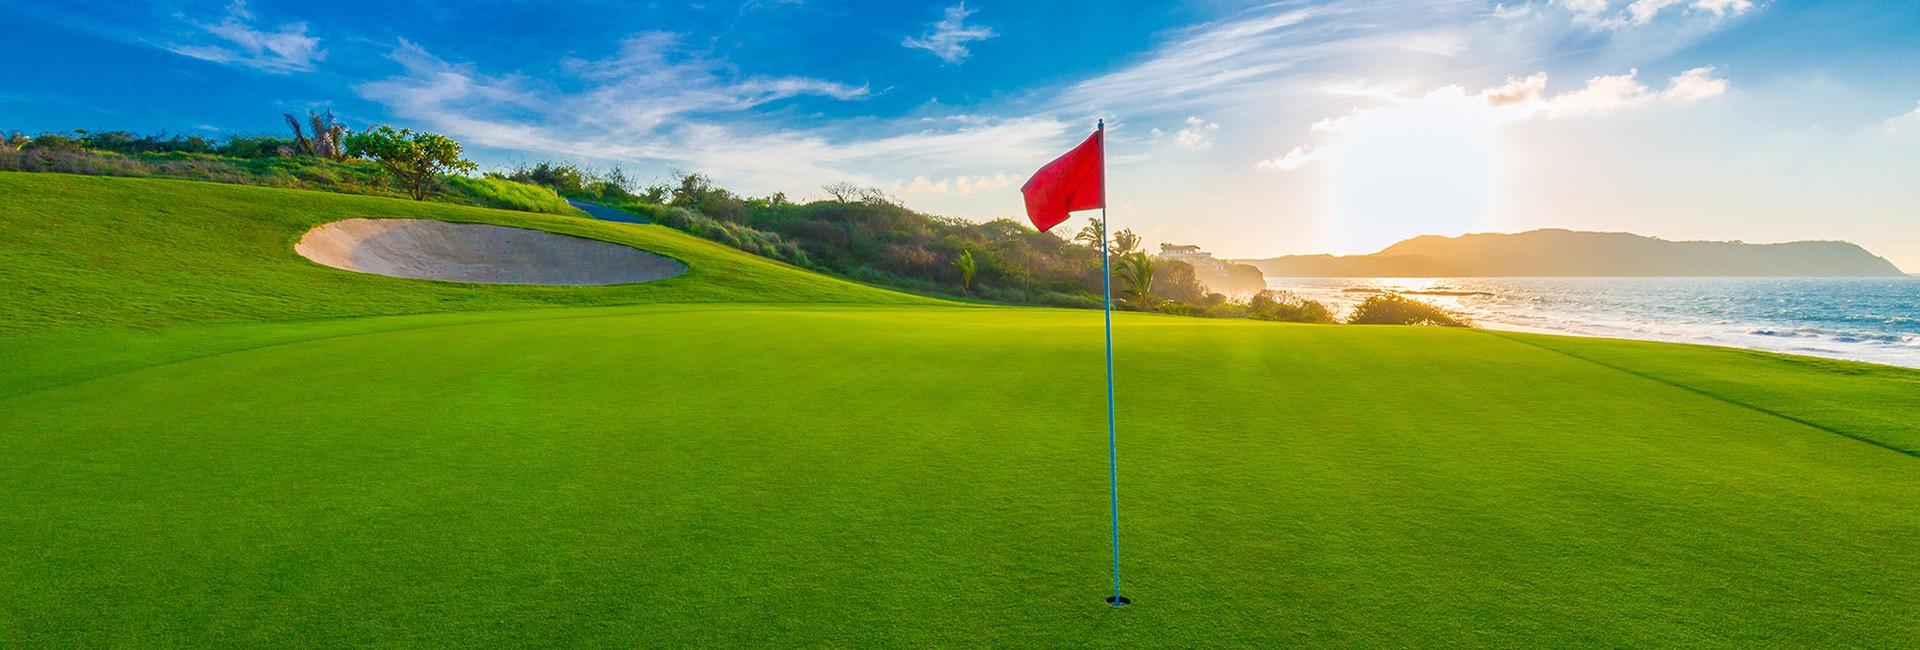 Golf in Marbella